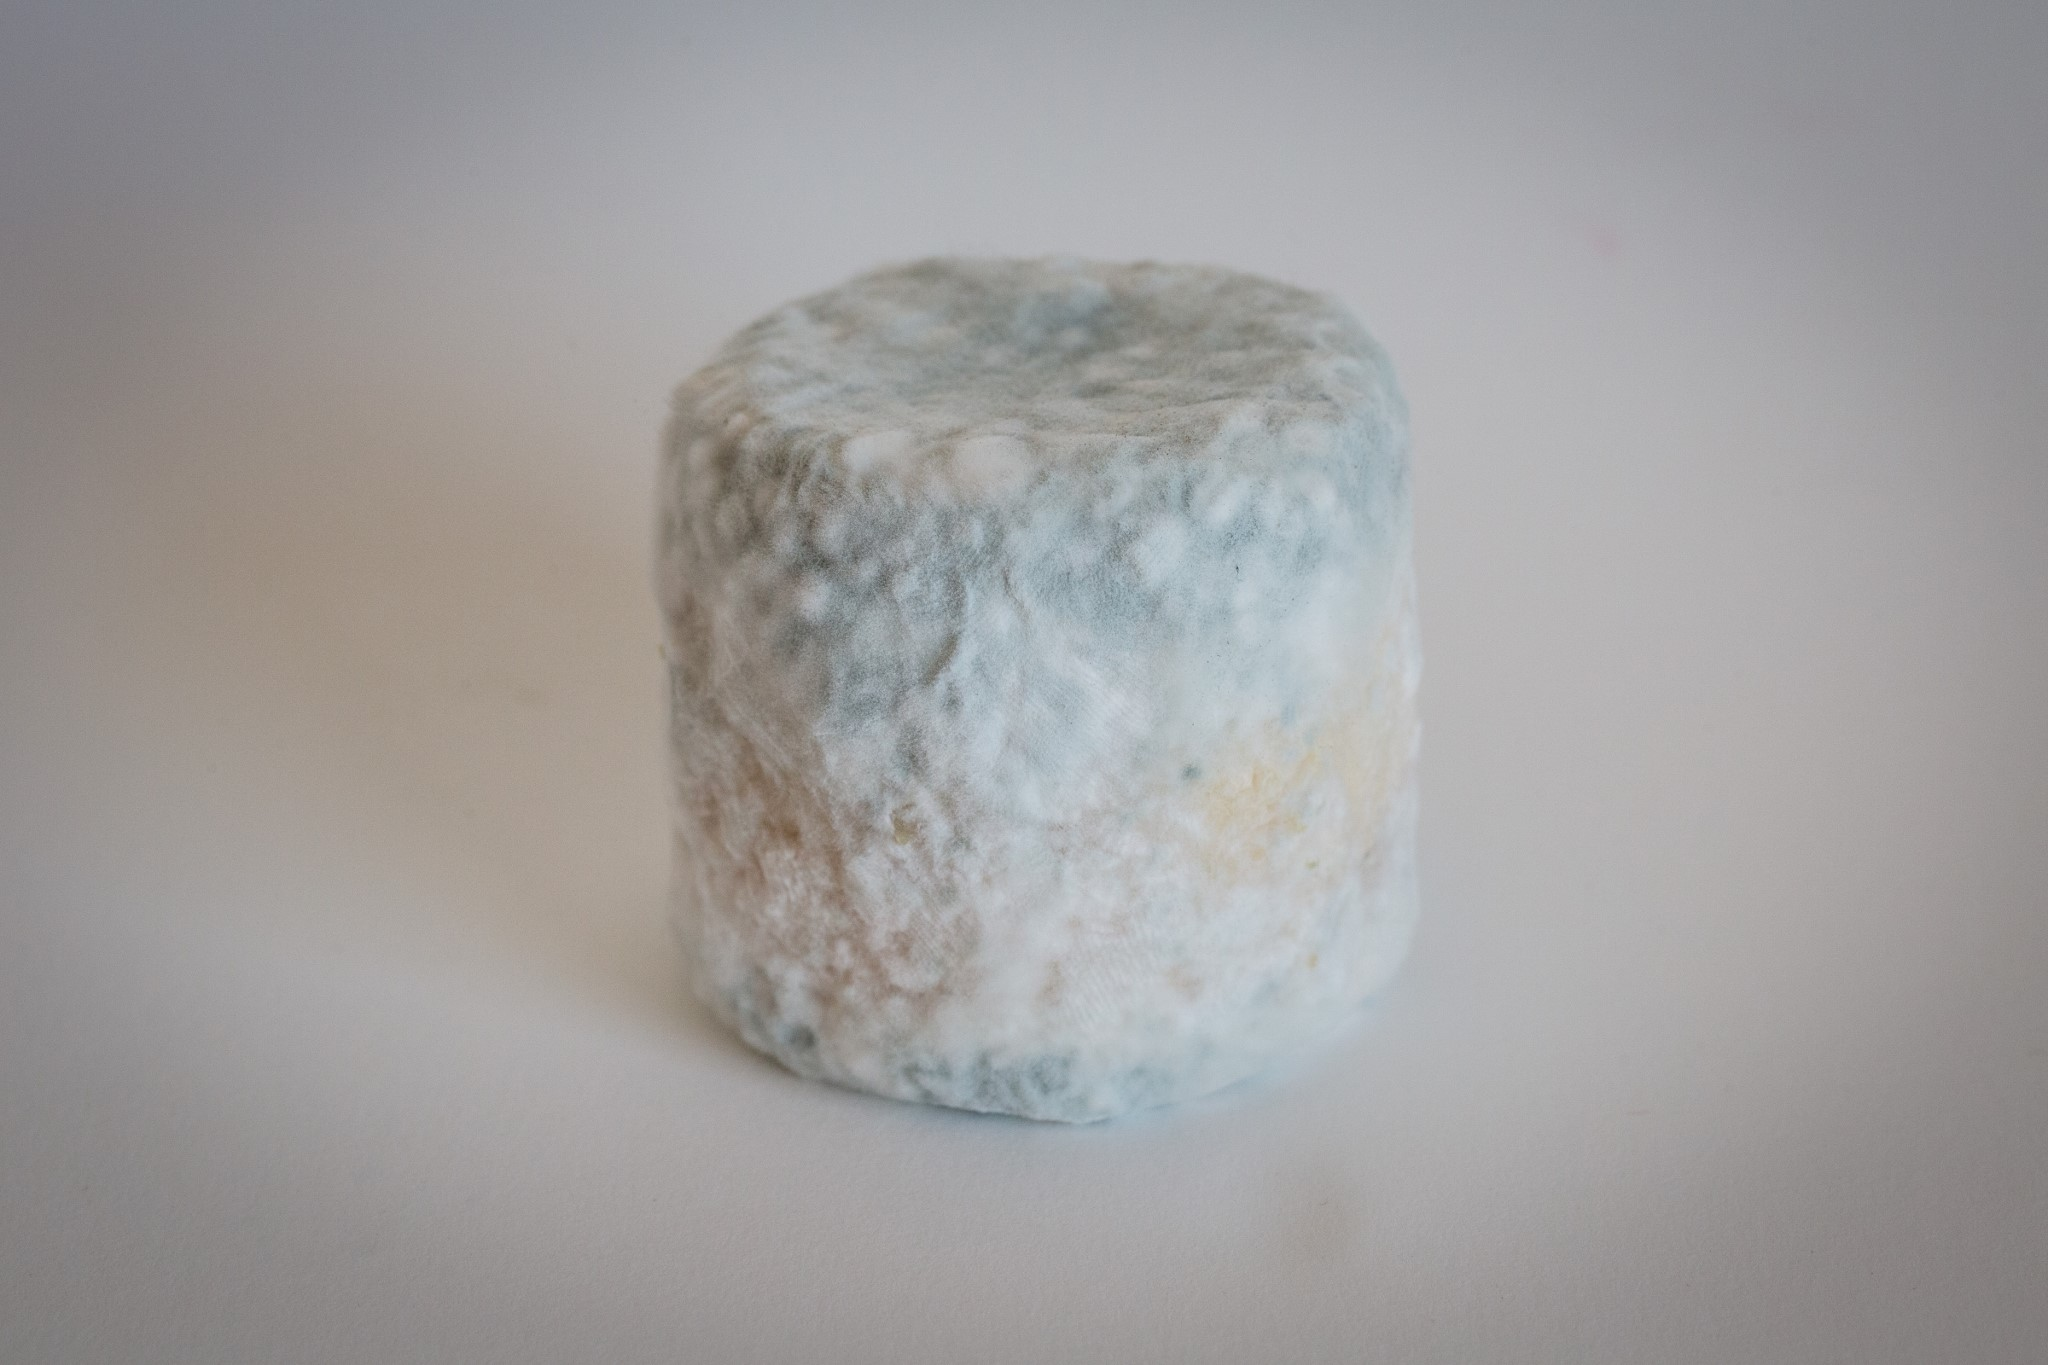 fromage-de-chevre-debut-de-bleu-4